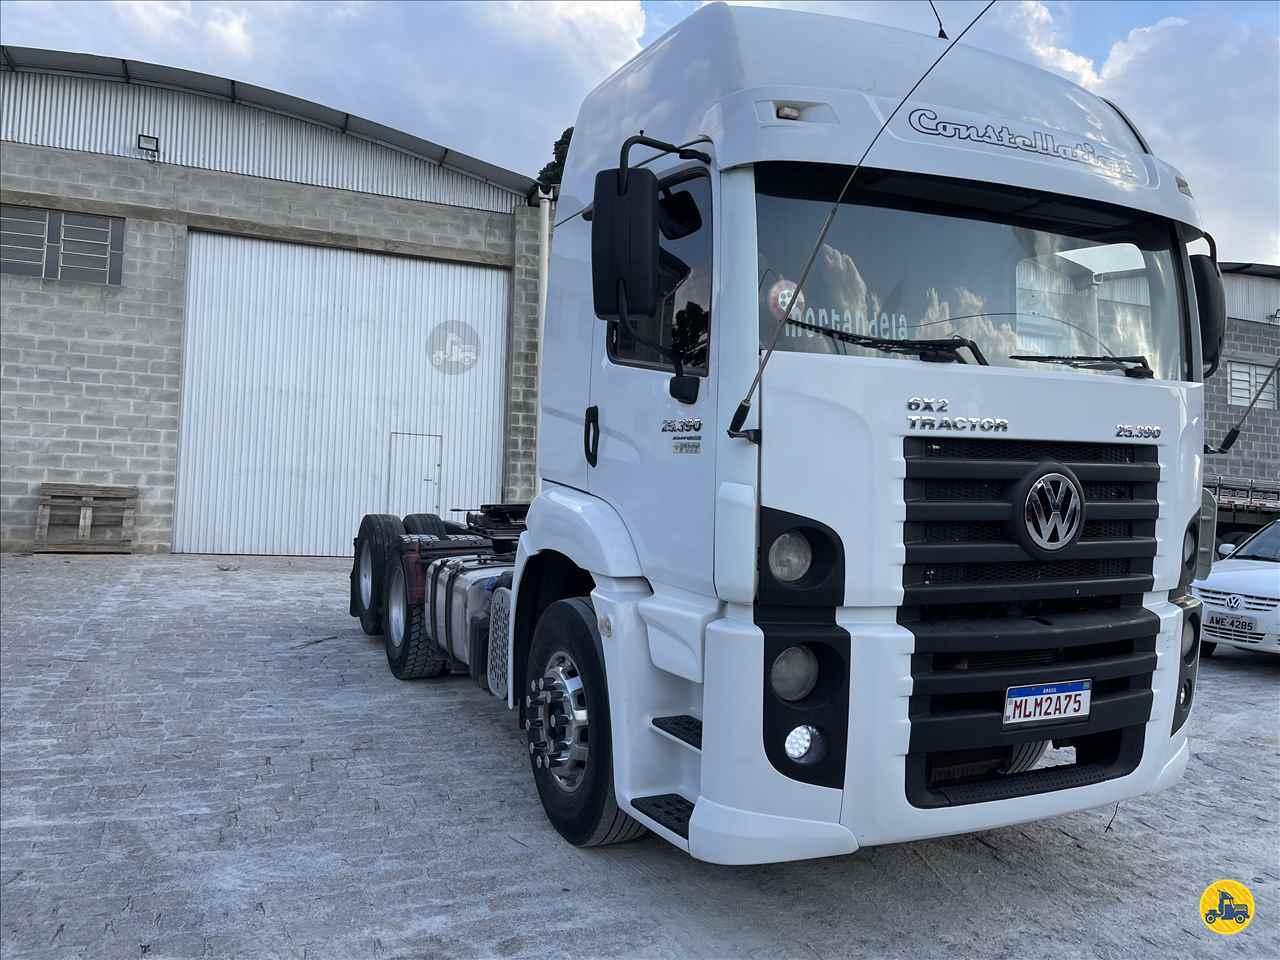 CAMINHAO VOLKSWAGEN VW 25390 Cavalo Mecânico Truck 6x2 Rodricardo Caminhões COLOMBO PARANÁ PR